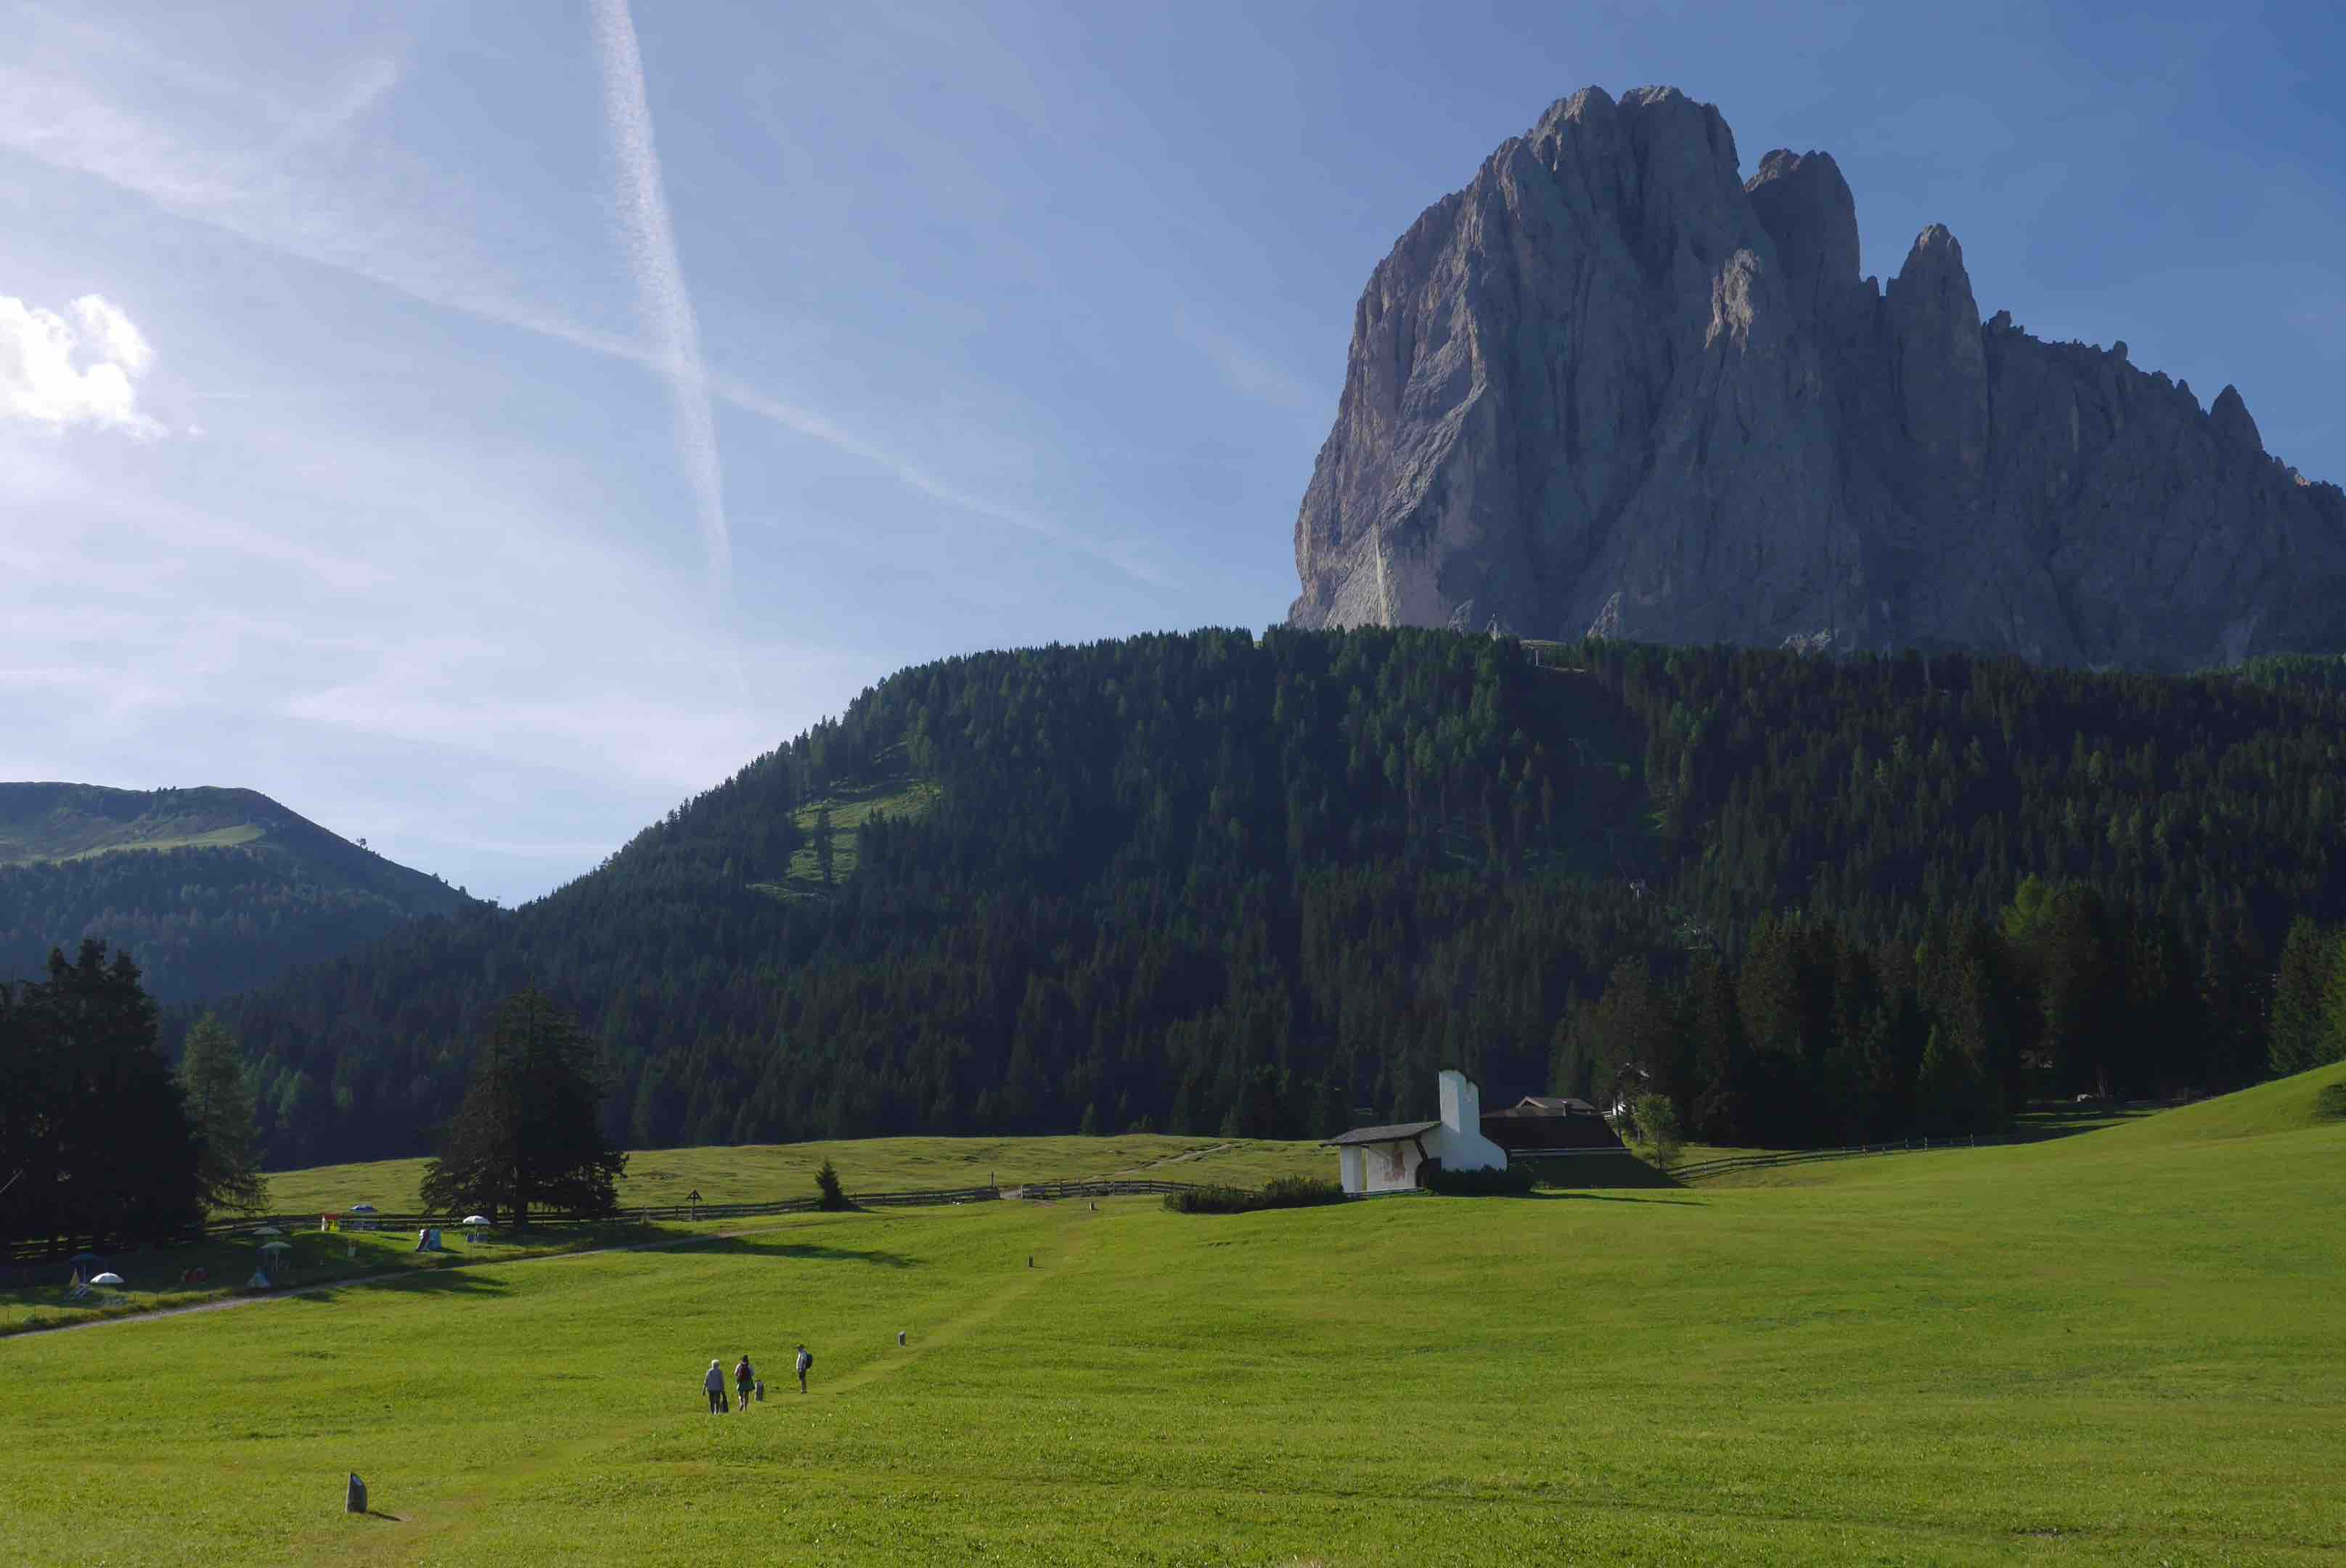 montagne-italie-ali-di-firenze-11